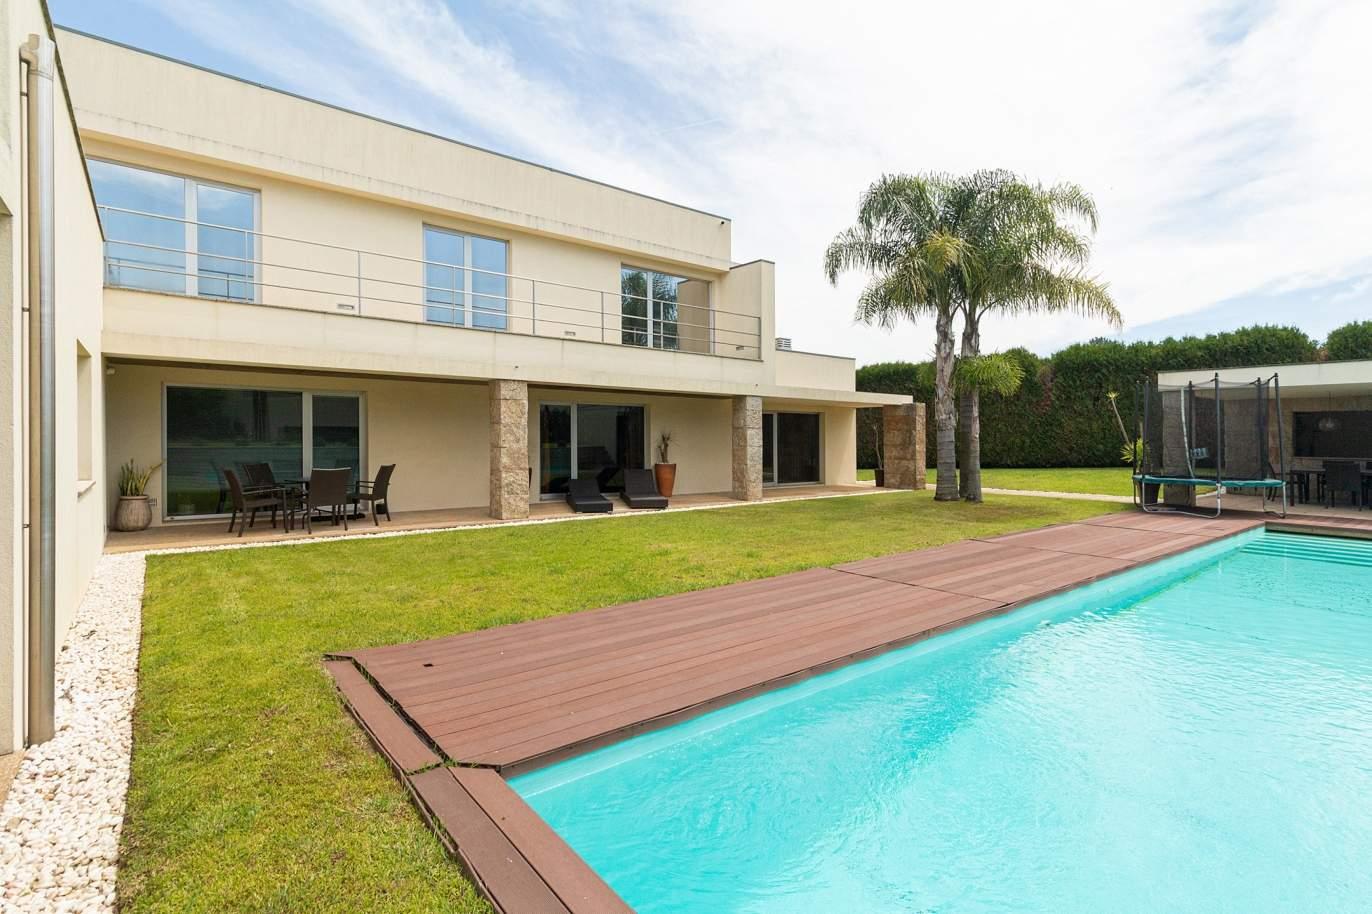 villa-avec-piscine-et-jardin-a-vendre-a-avintes-v-n-gaia-portugal